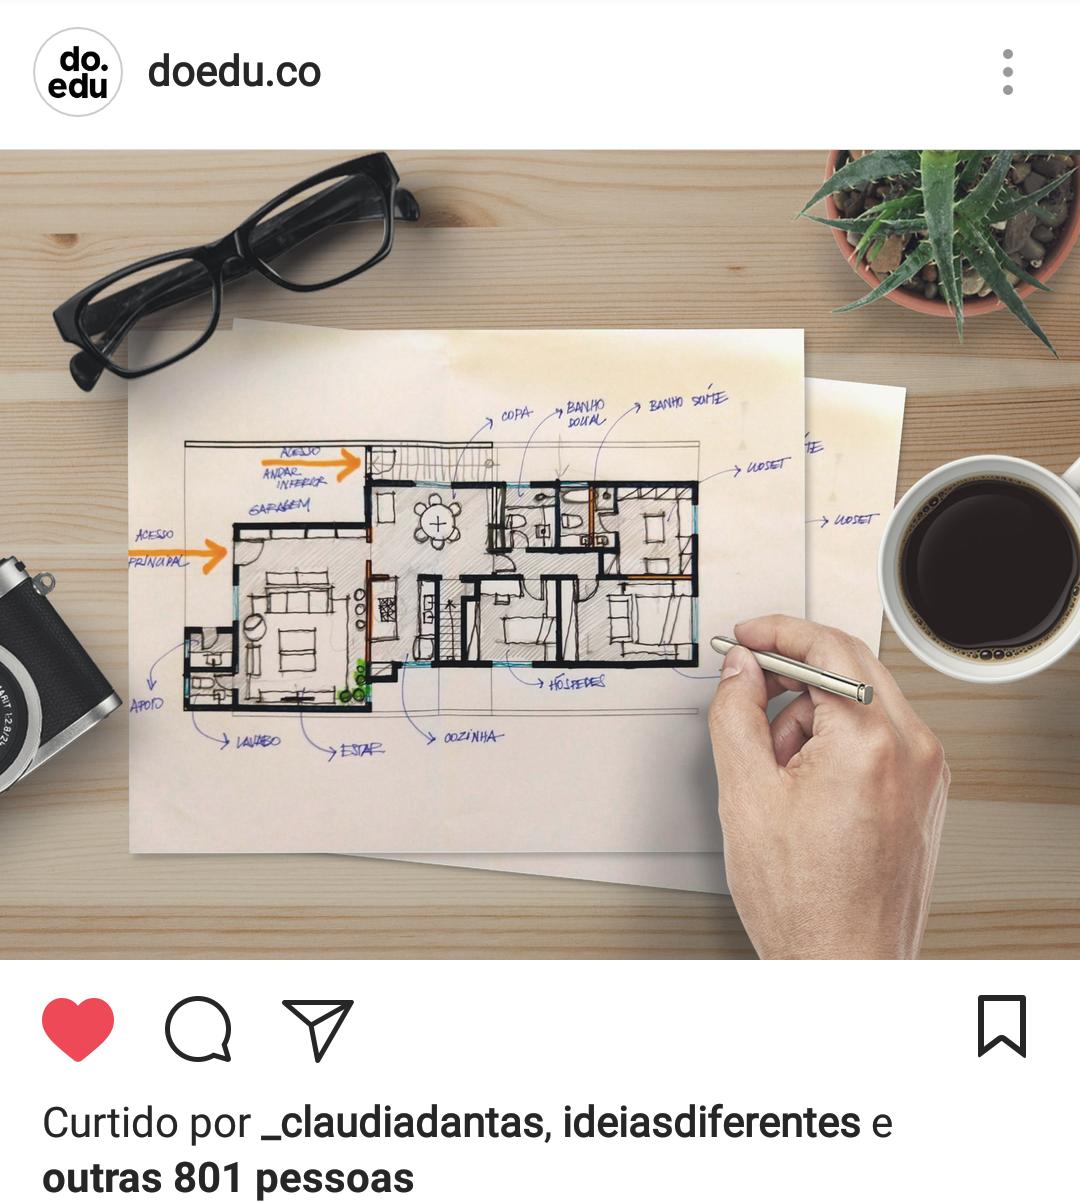 Instagram @doedu.co